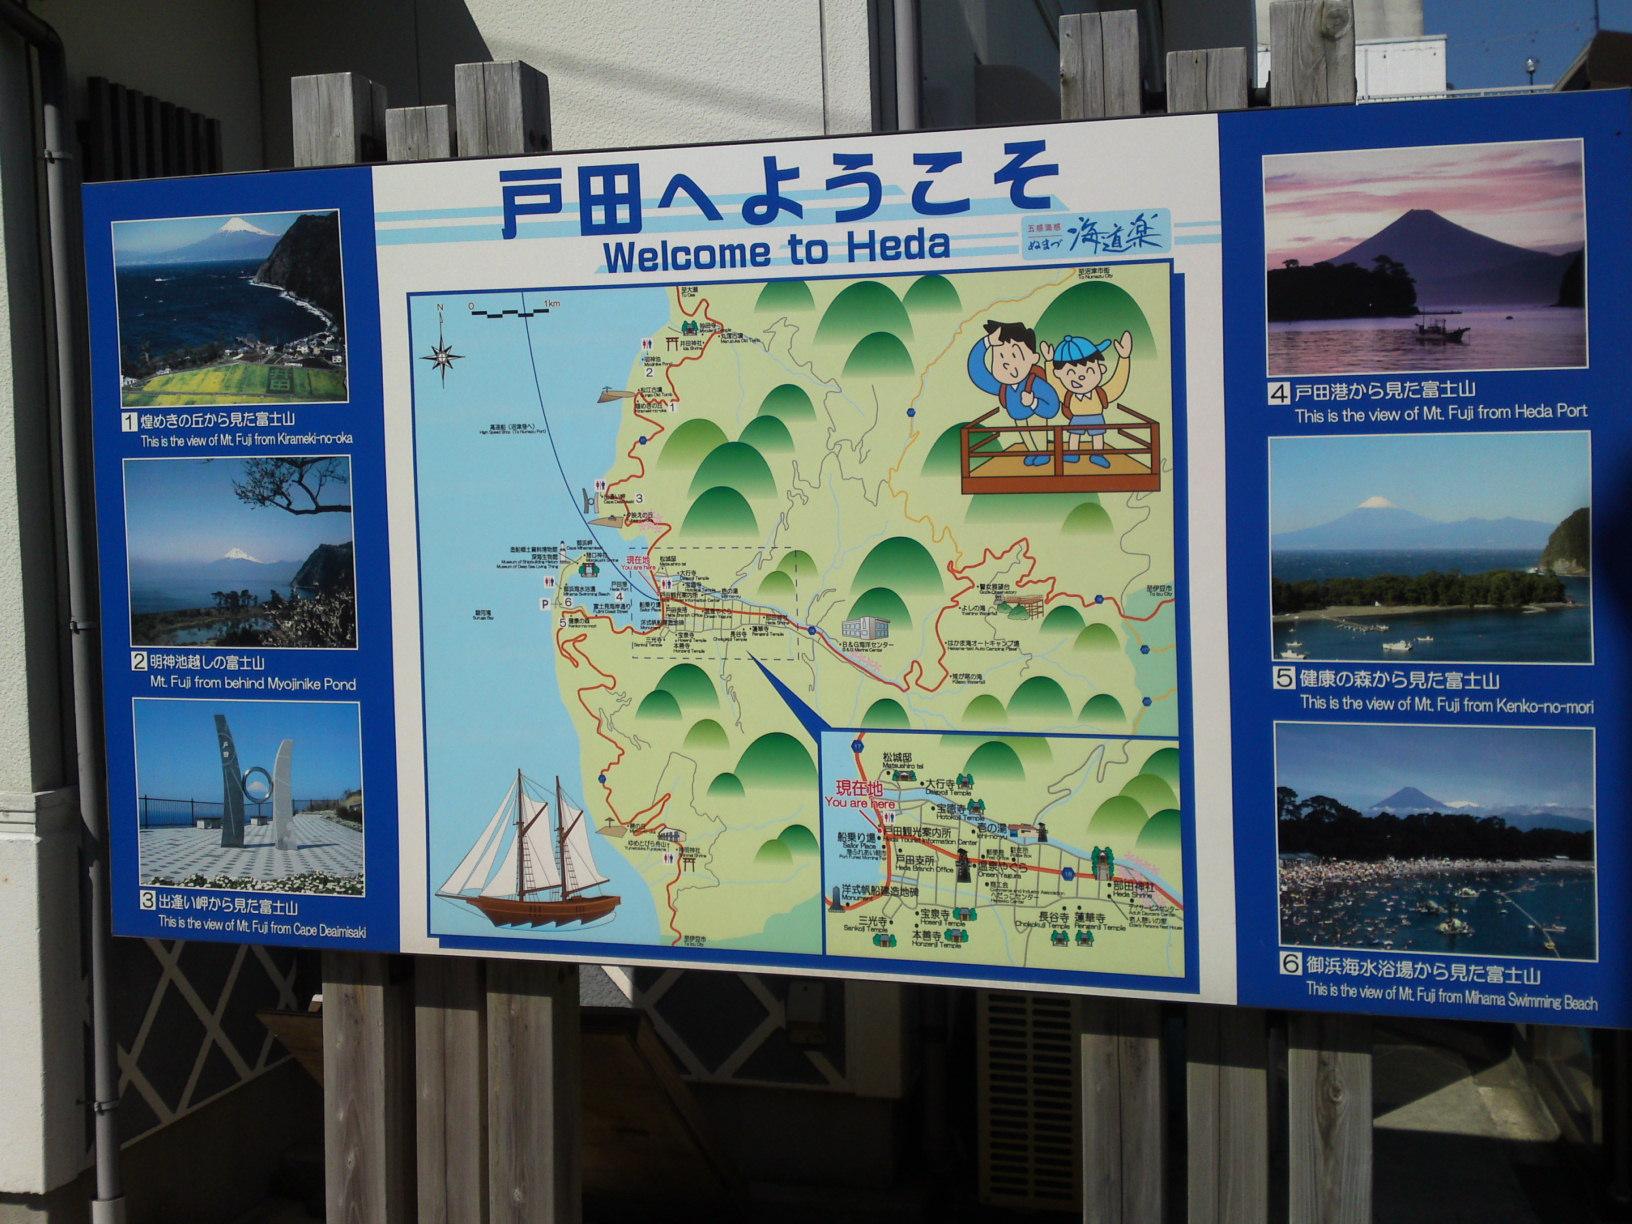 Heda Izu Peninsula Mount Fuji view beach crab museum